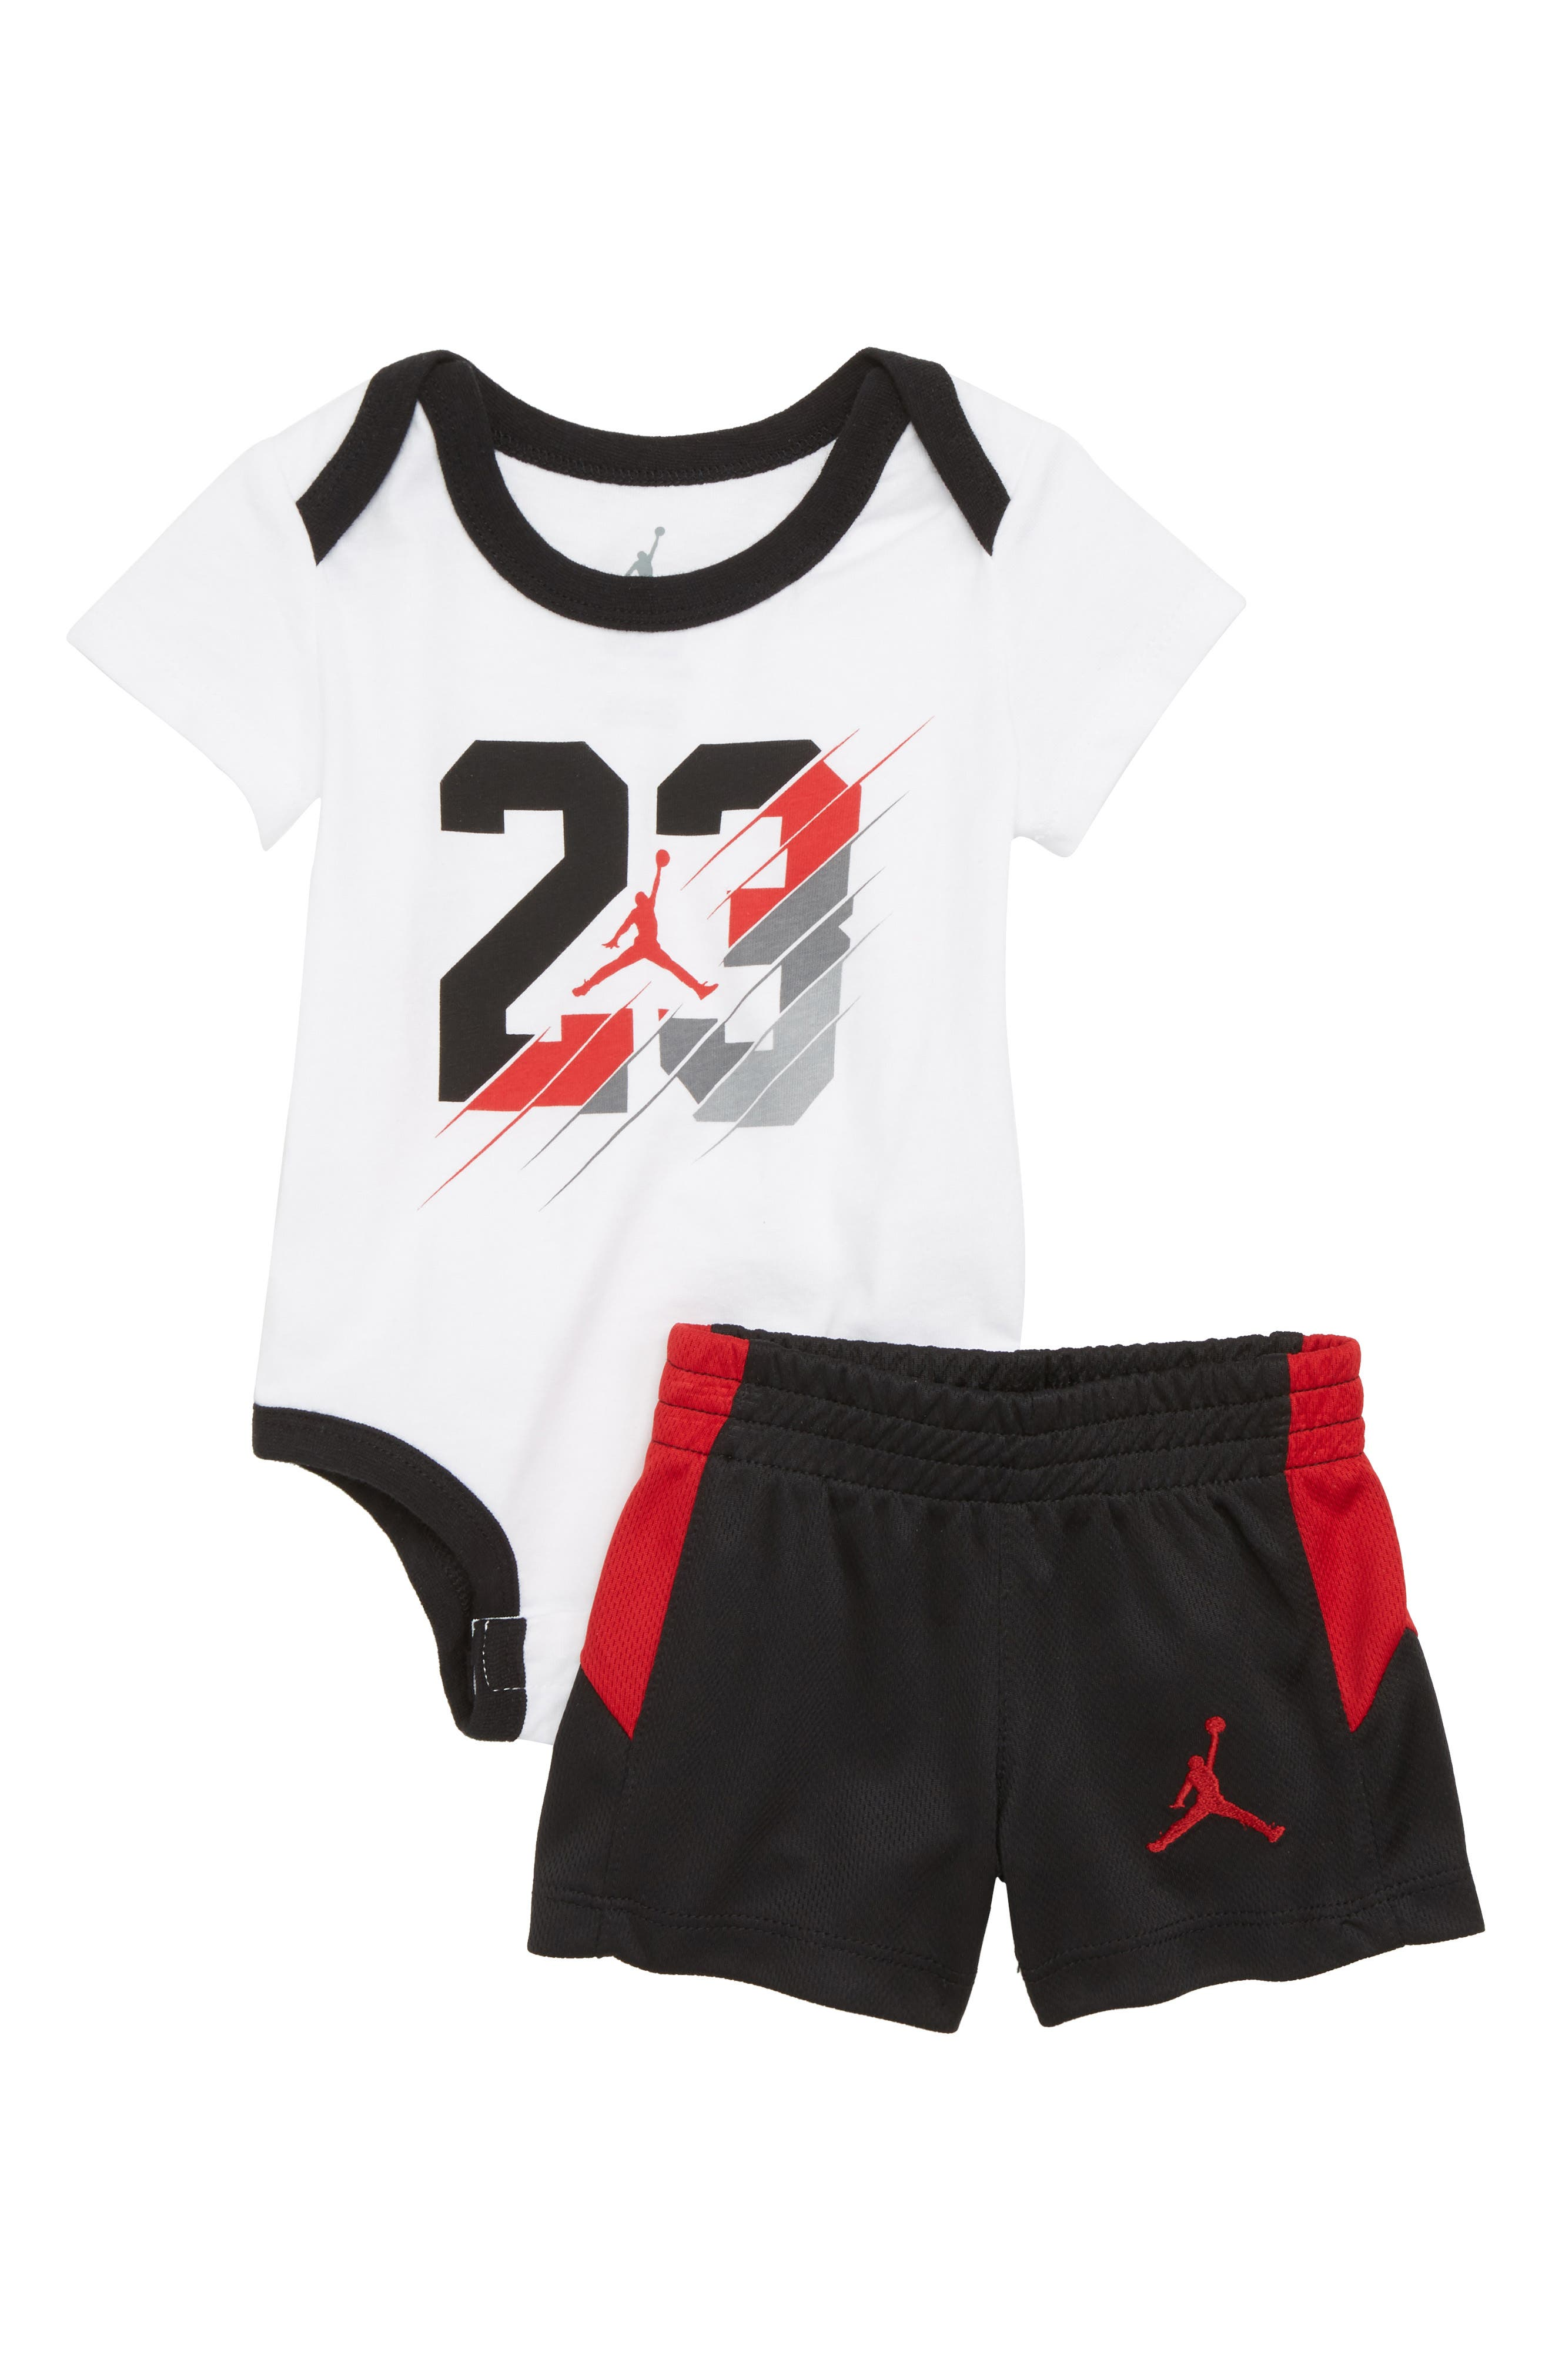 Jordan 23 Slash Creeper Bodysuit & Mesh Shorts Set (Baby)